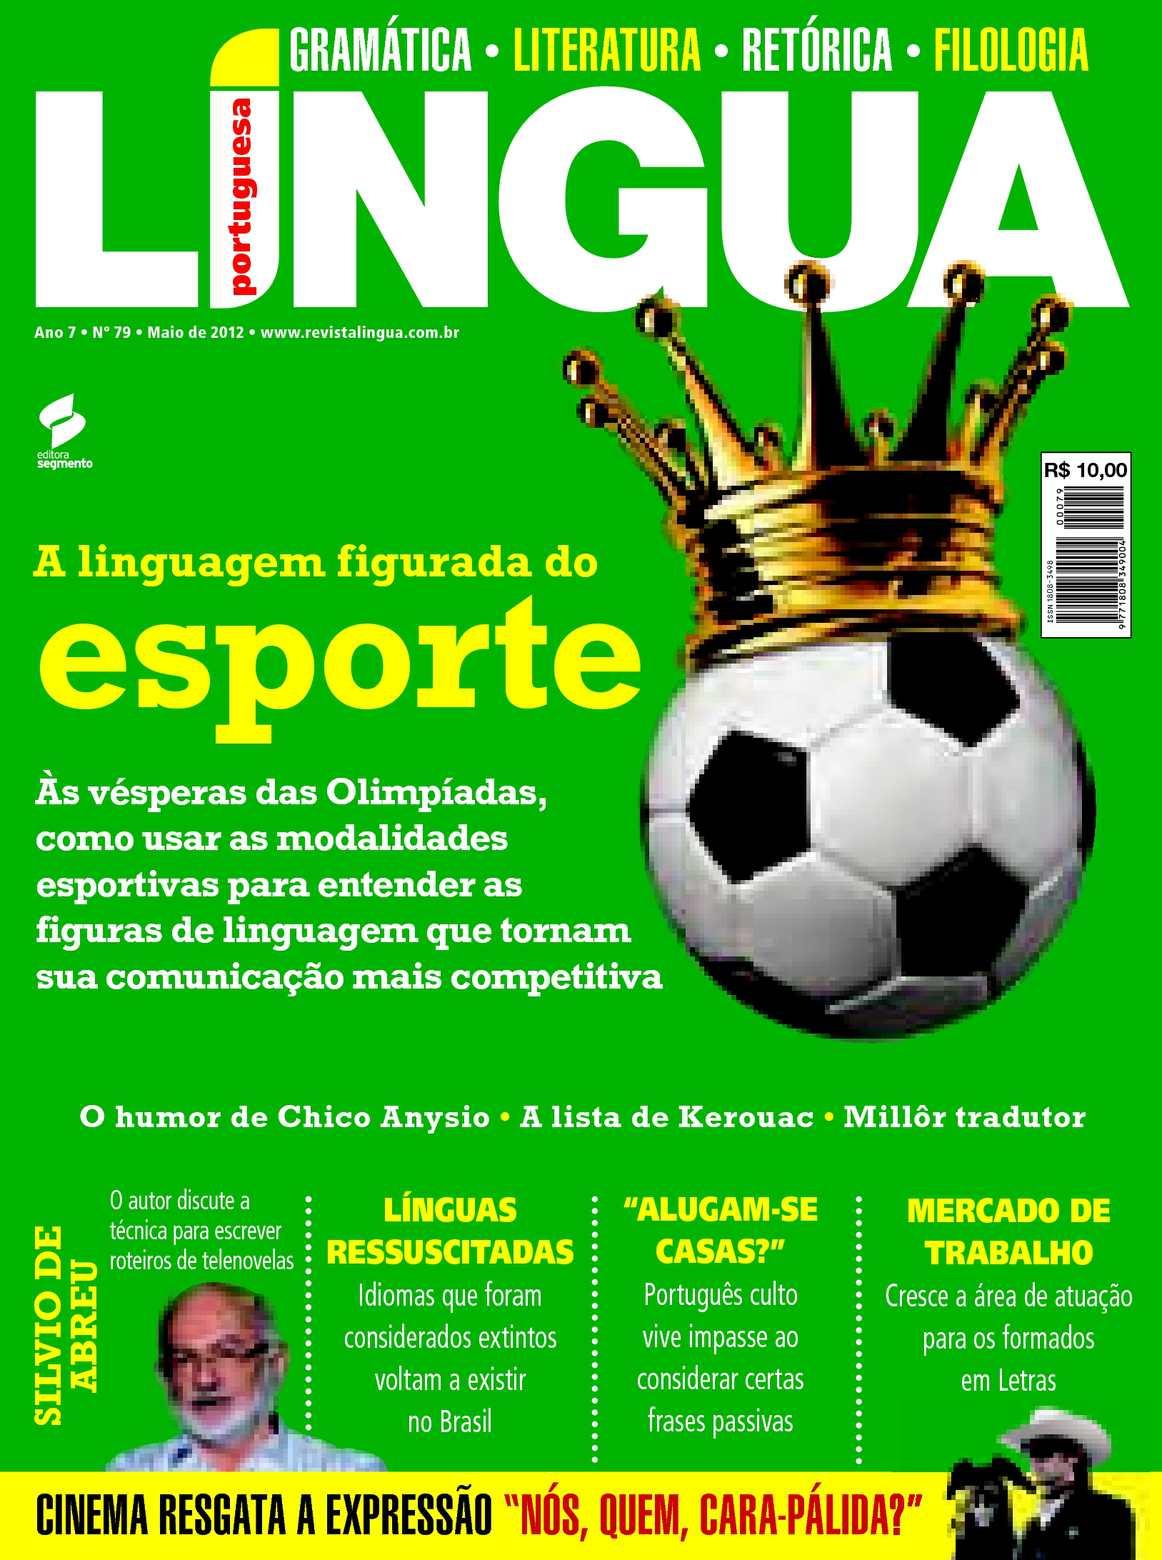 Calaméo - Revista Língua Portuguesa - Edição 79 c8a110f8646f4